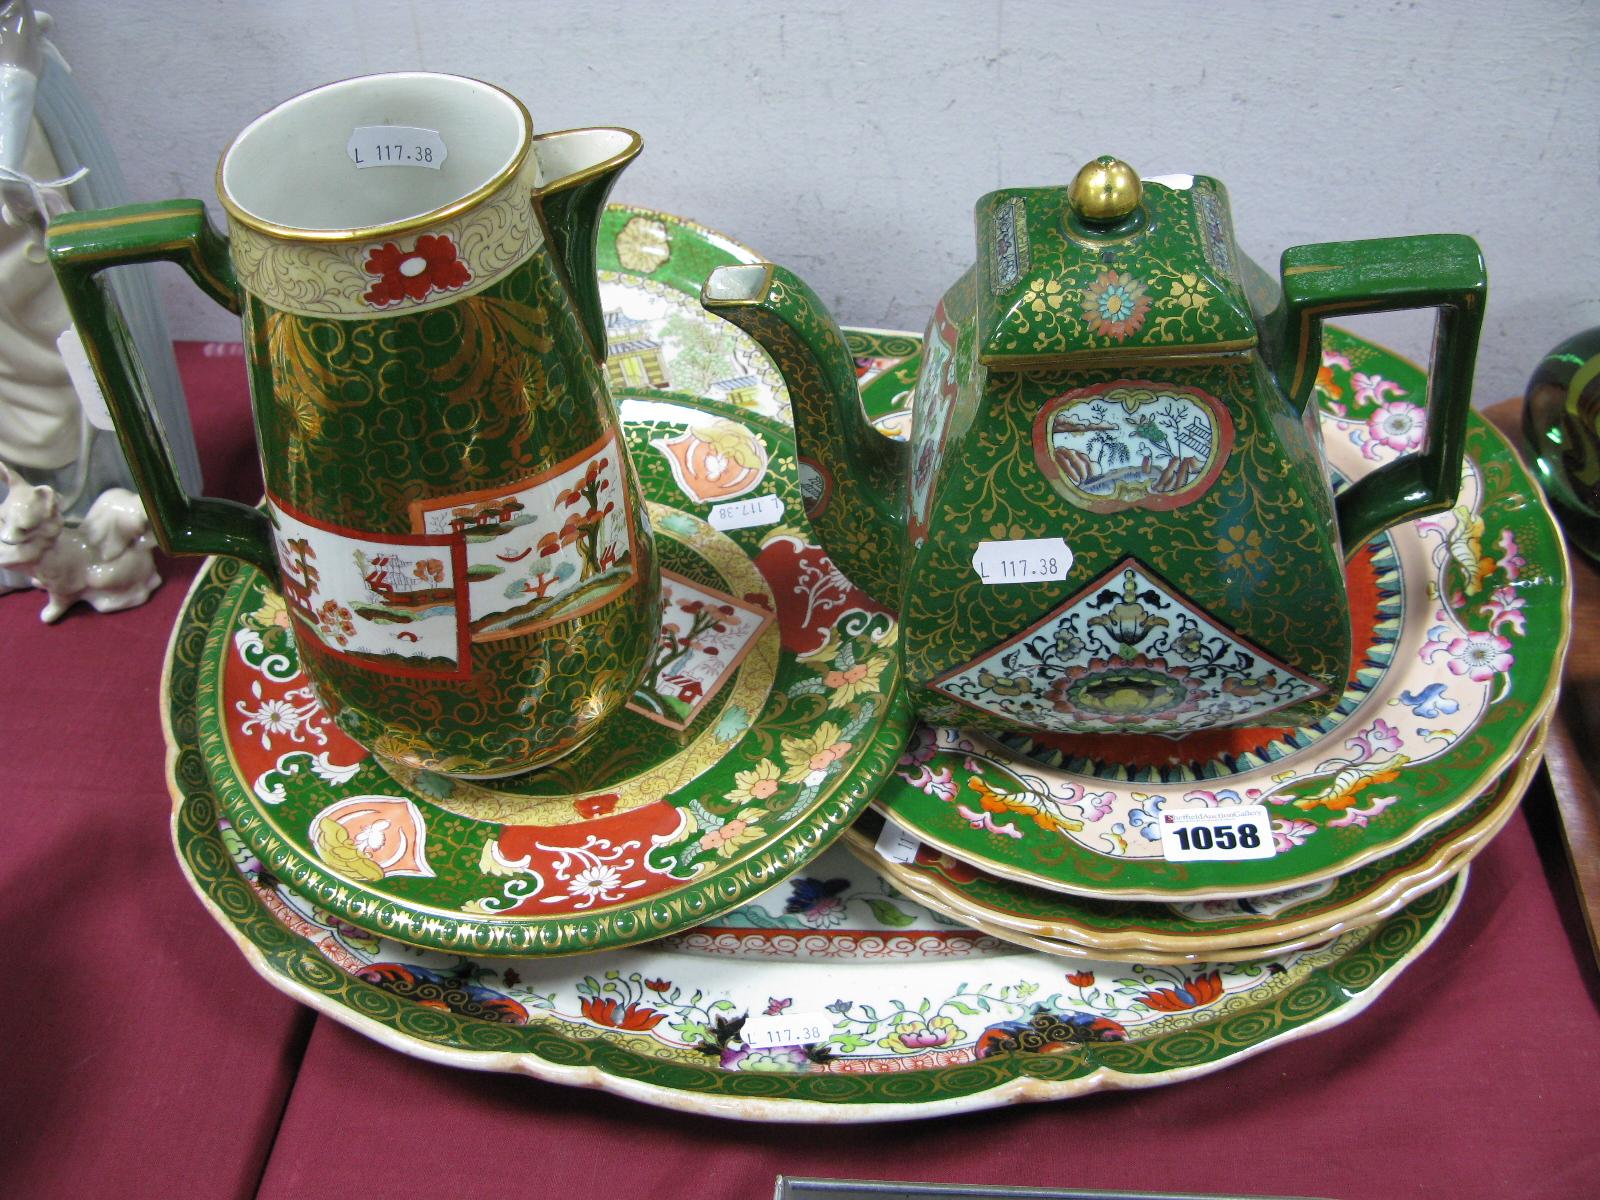 Lot 1058 - Ashworth's Ironstone China Comport, in the Double Landscape pattern, a similar jug, teapot Mason's